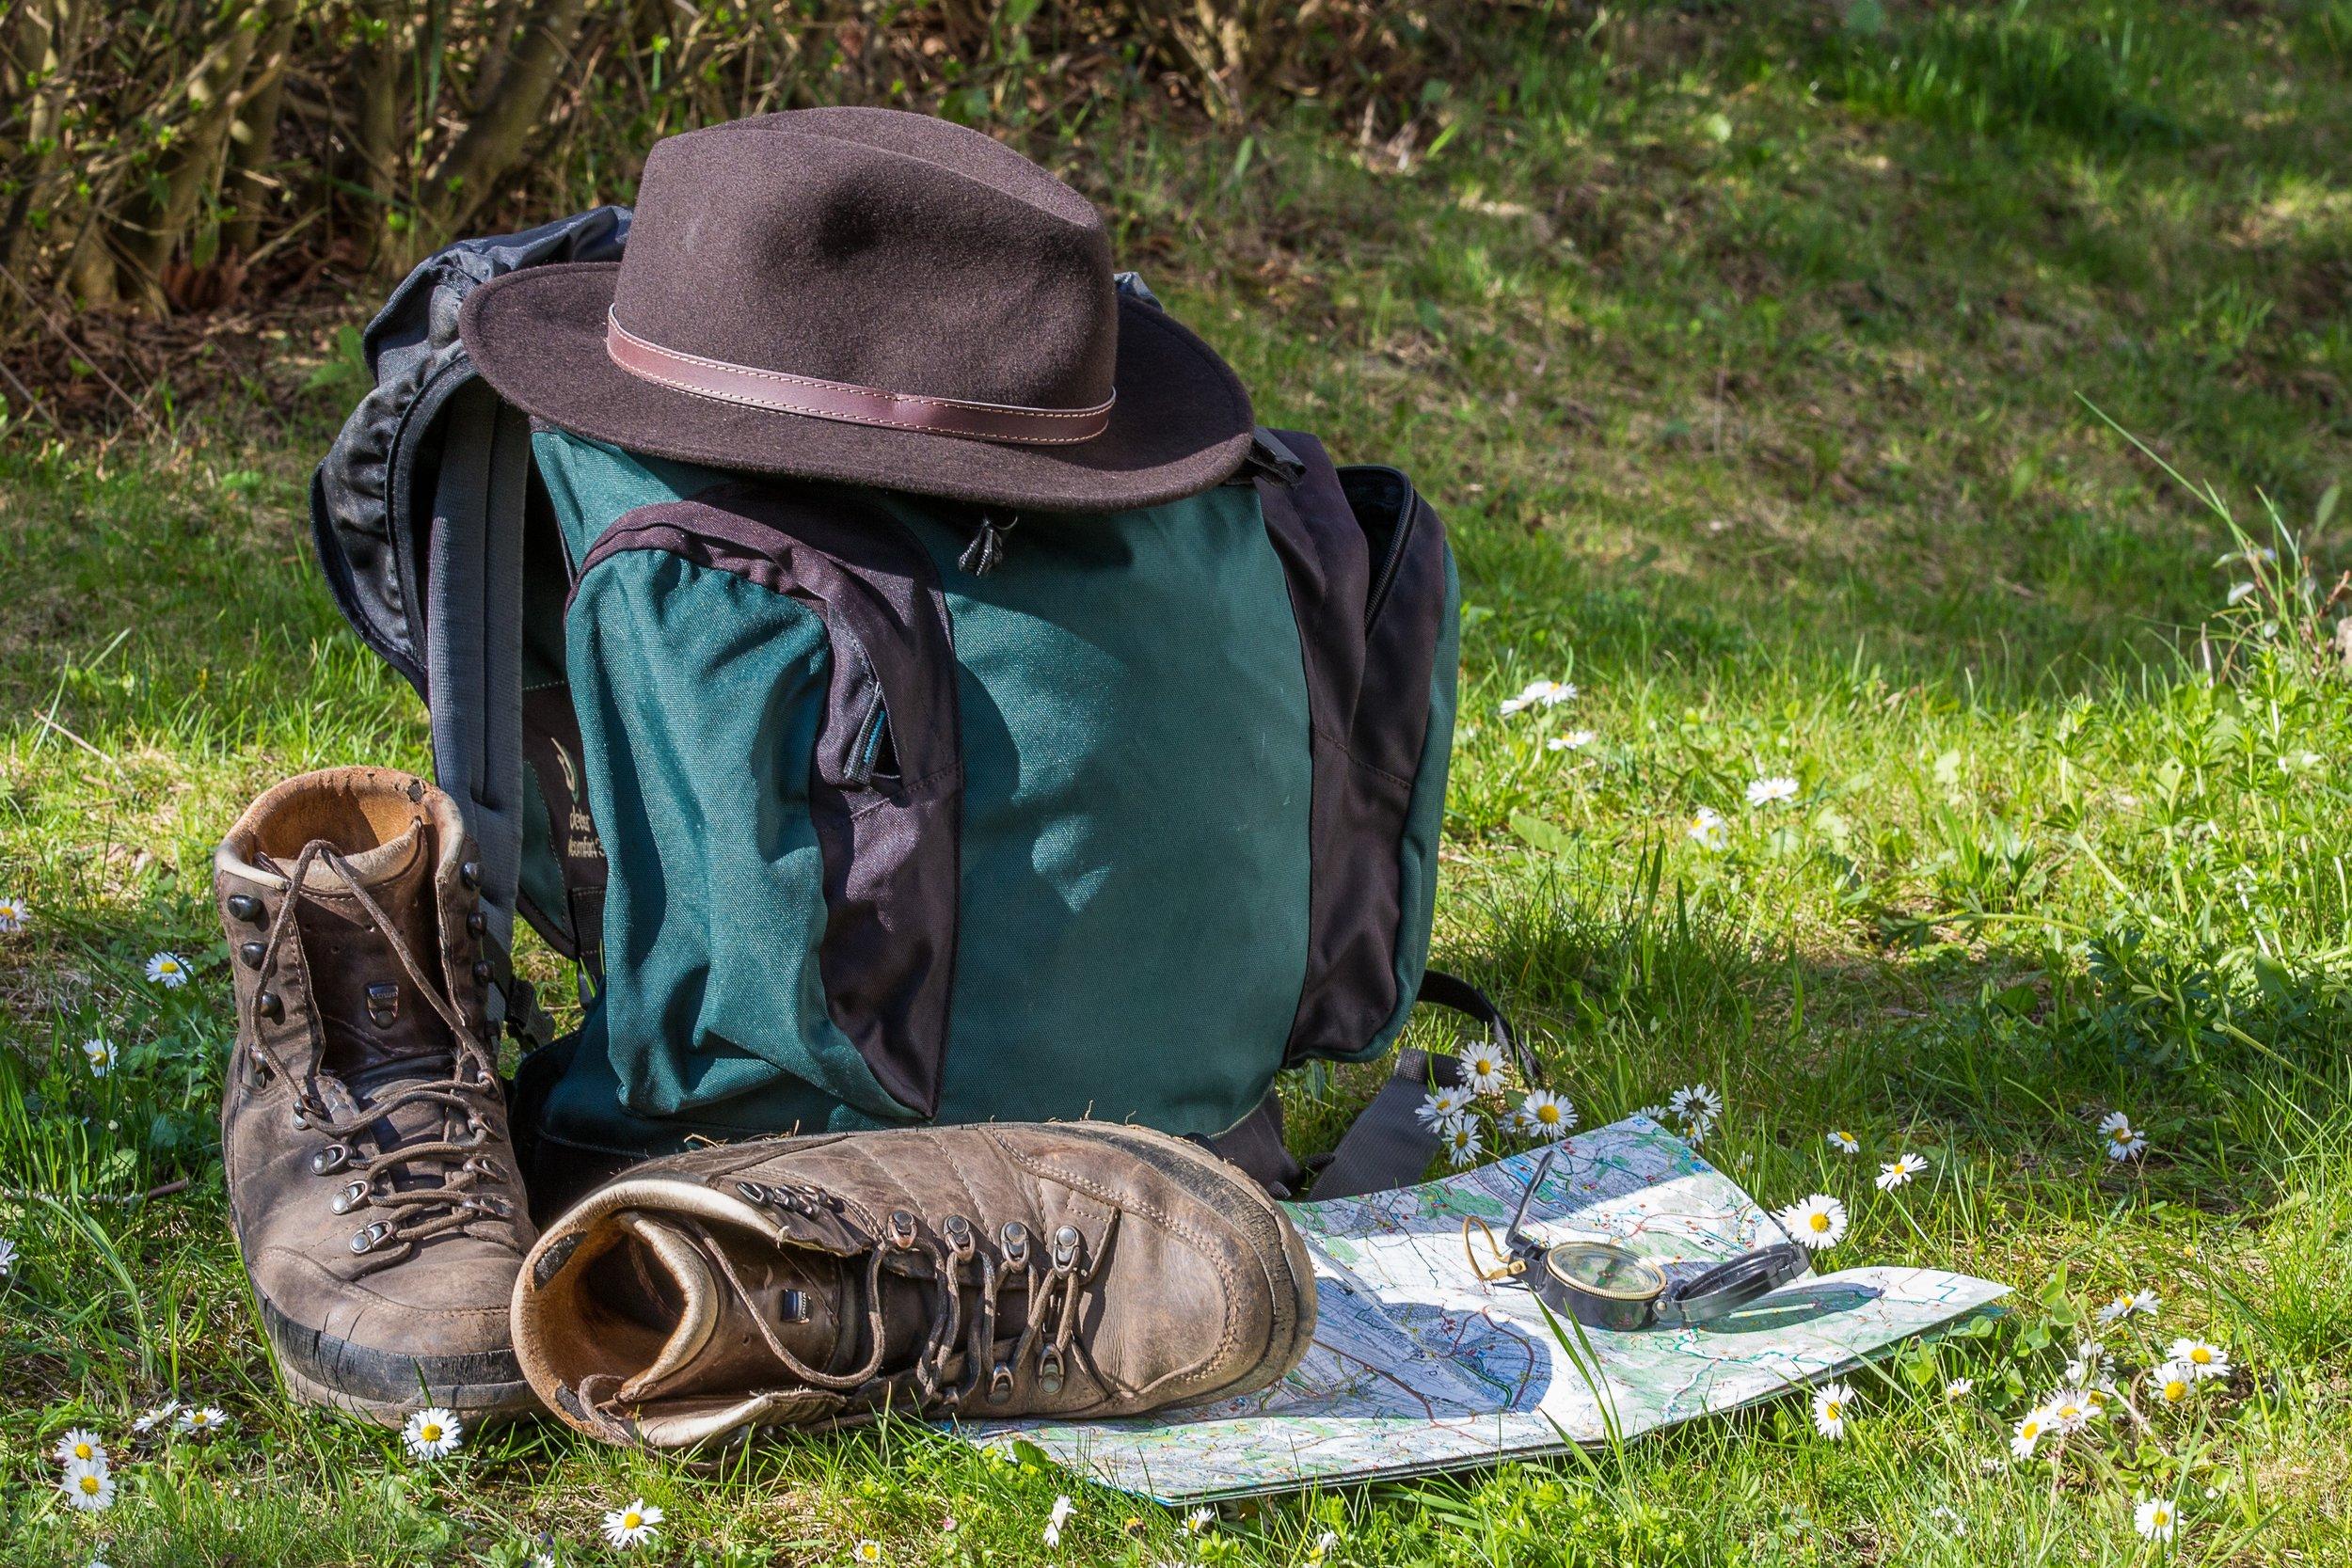 Travel Tip #3: Pack Strategically